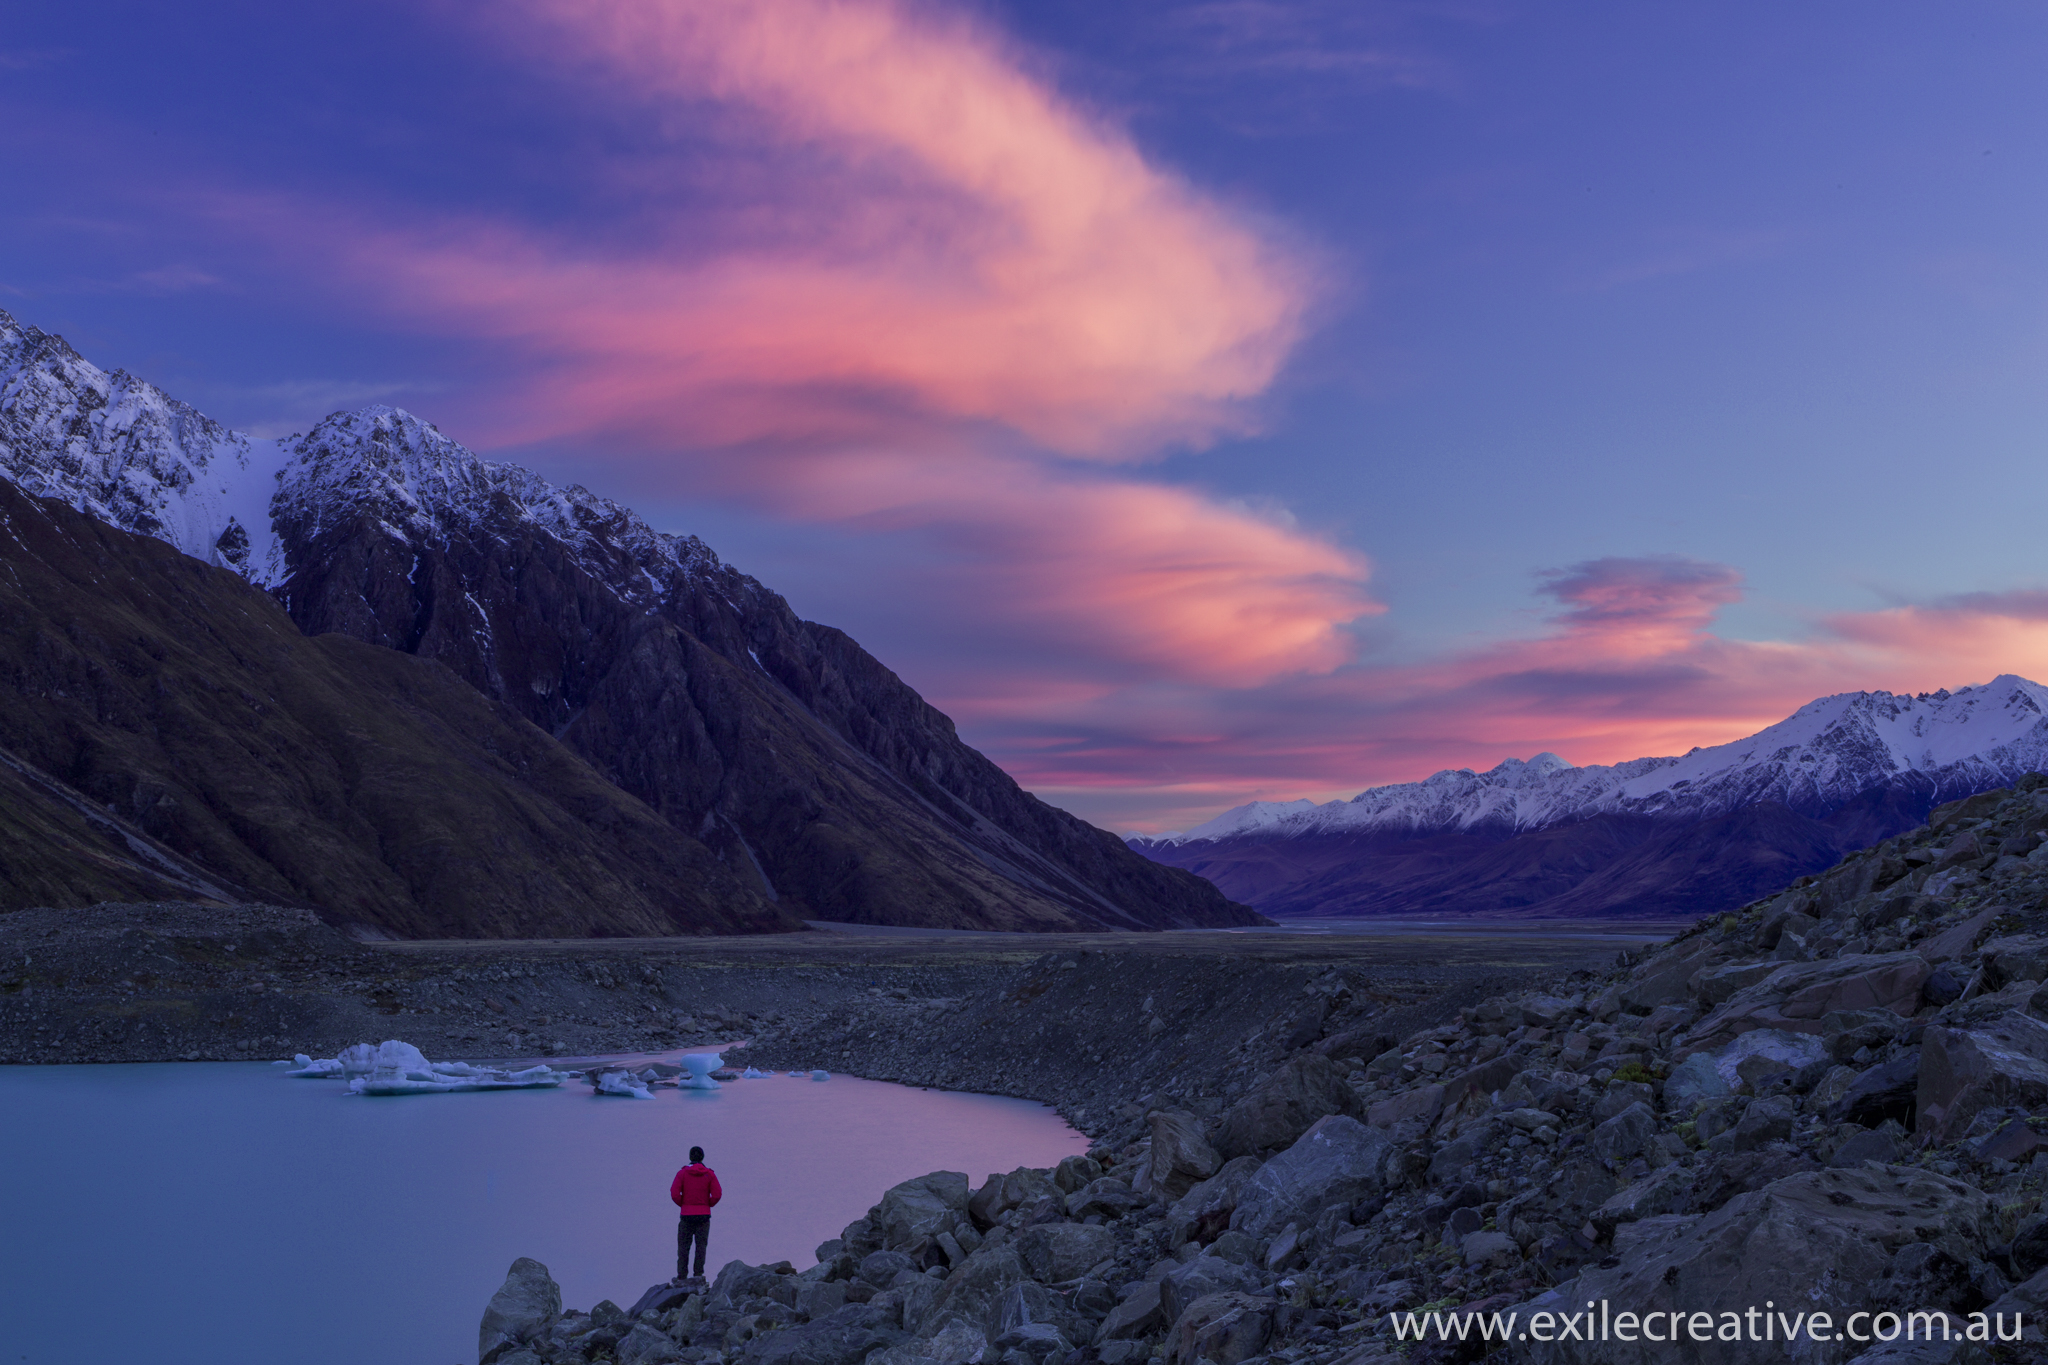 Tasman Lake  Canon 5Dmiii, 24-105L IS @ 50mm, ISO50, f/22, 6s